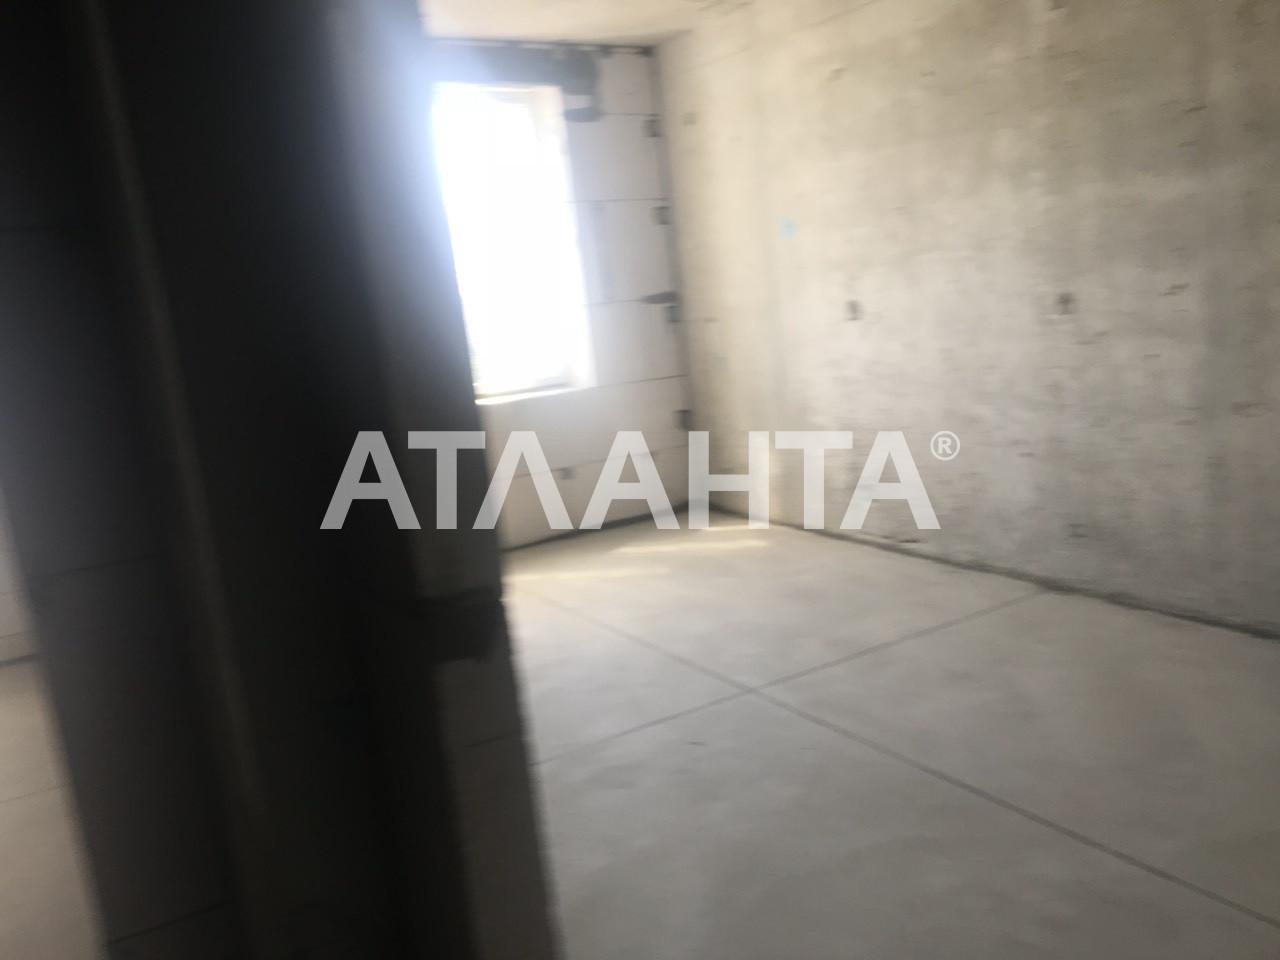 Продается 3-комнатная Квартира на ул. Канатная (Свердлова) — 83 000 у.е. (фото №4)